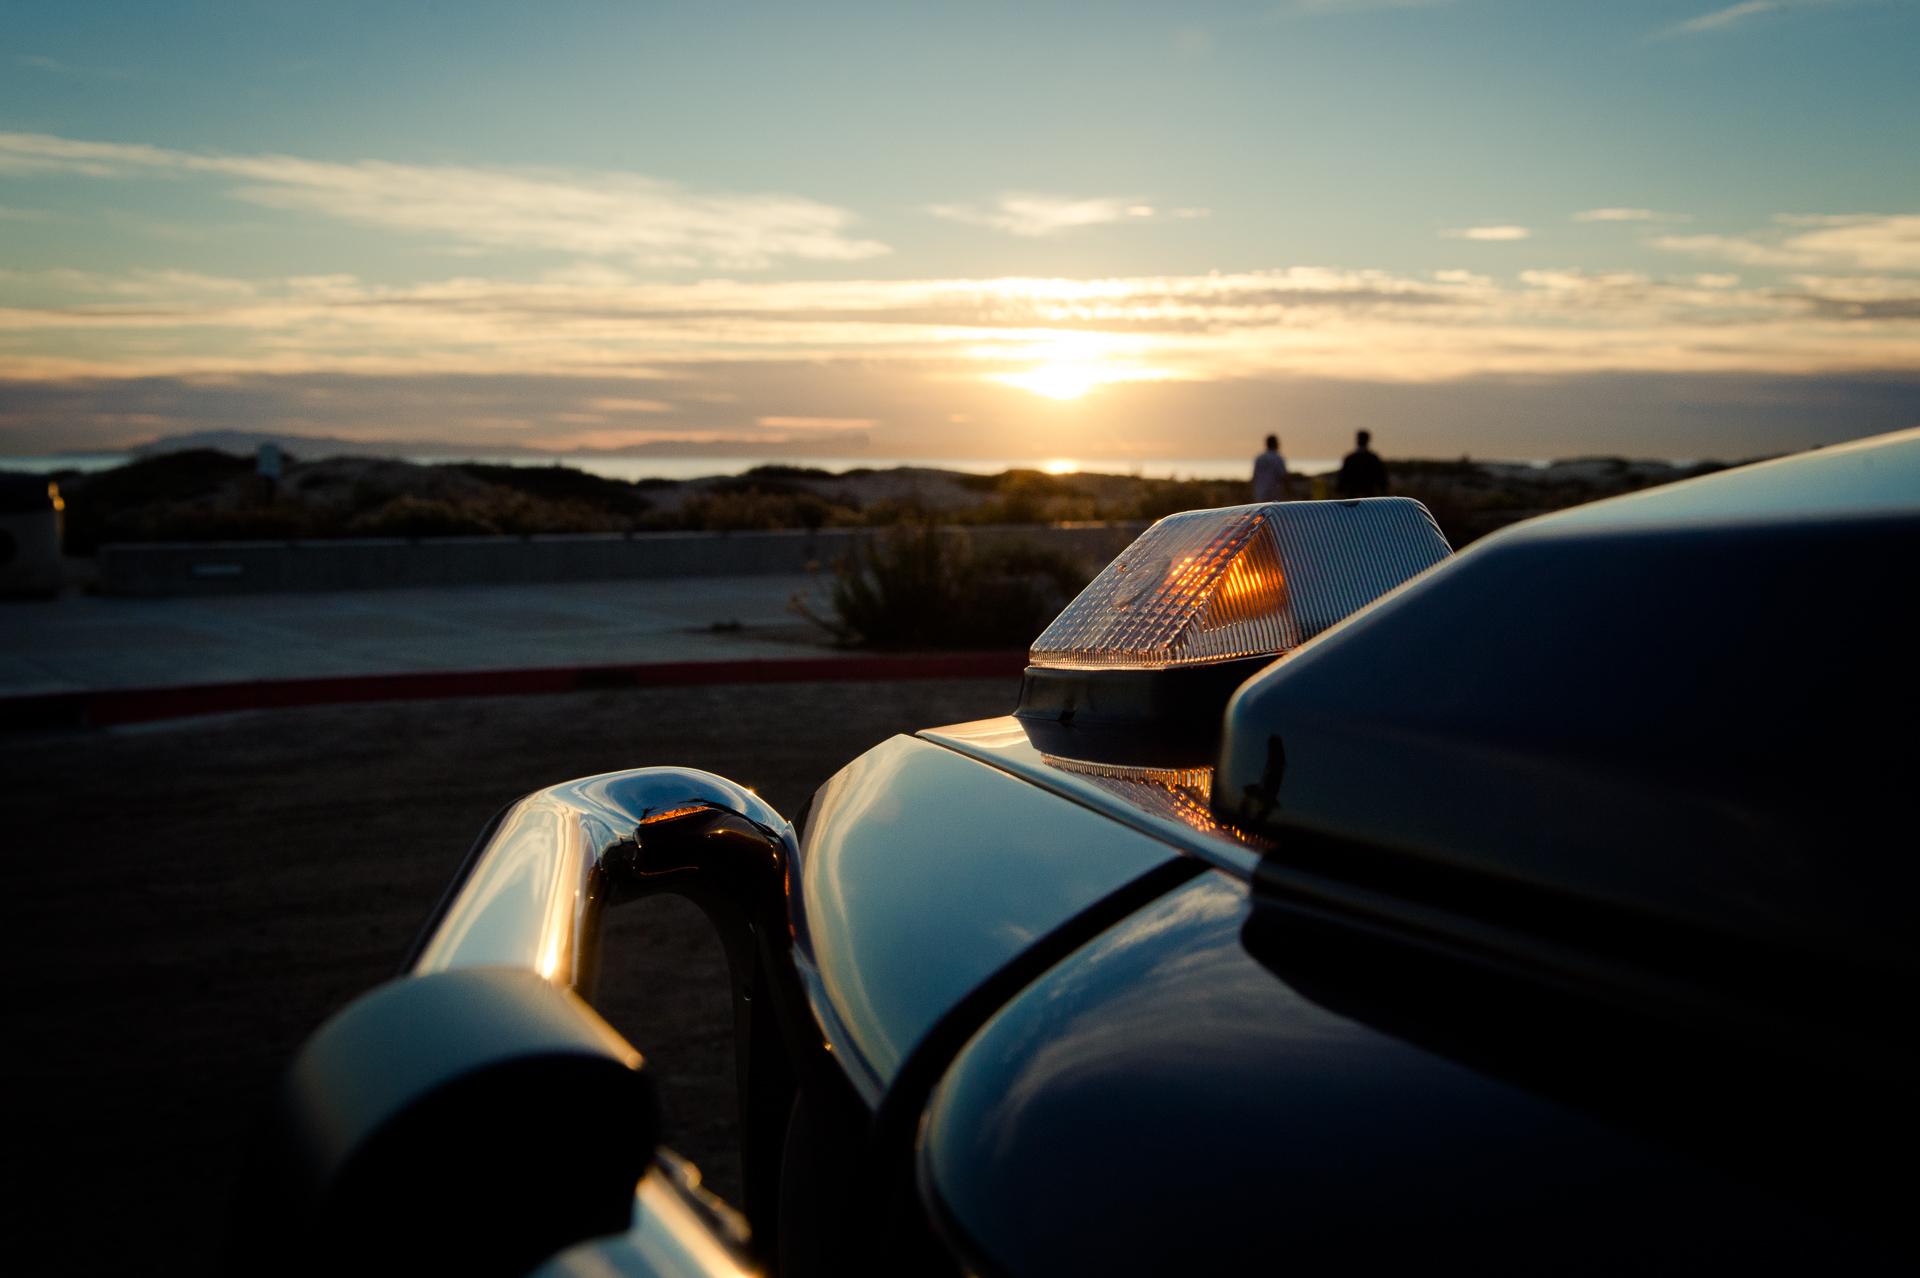 2014-Mercedes-Benz-G500-G550-braun-Kalifornien-mbrt14-54